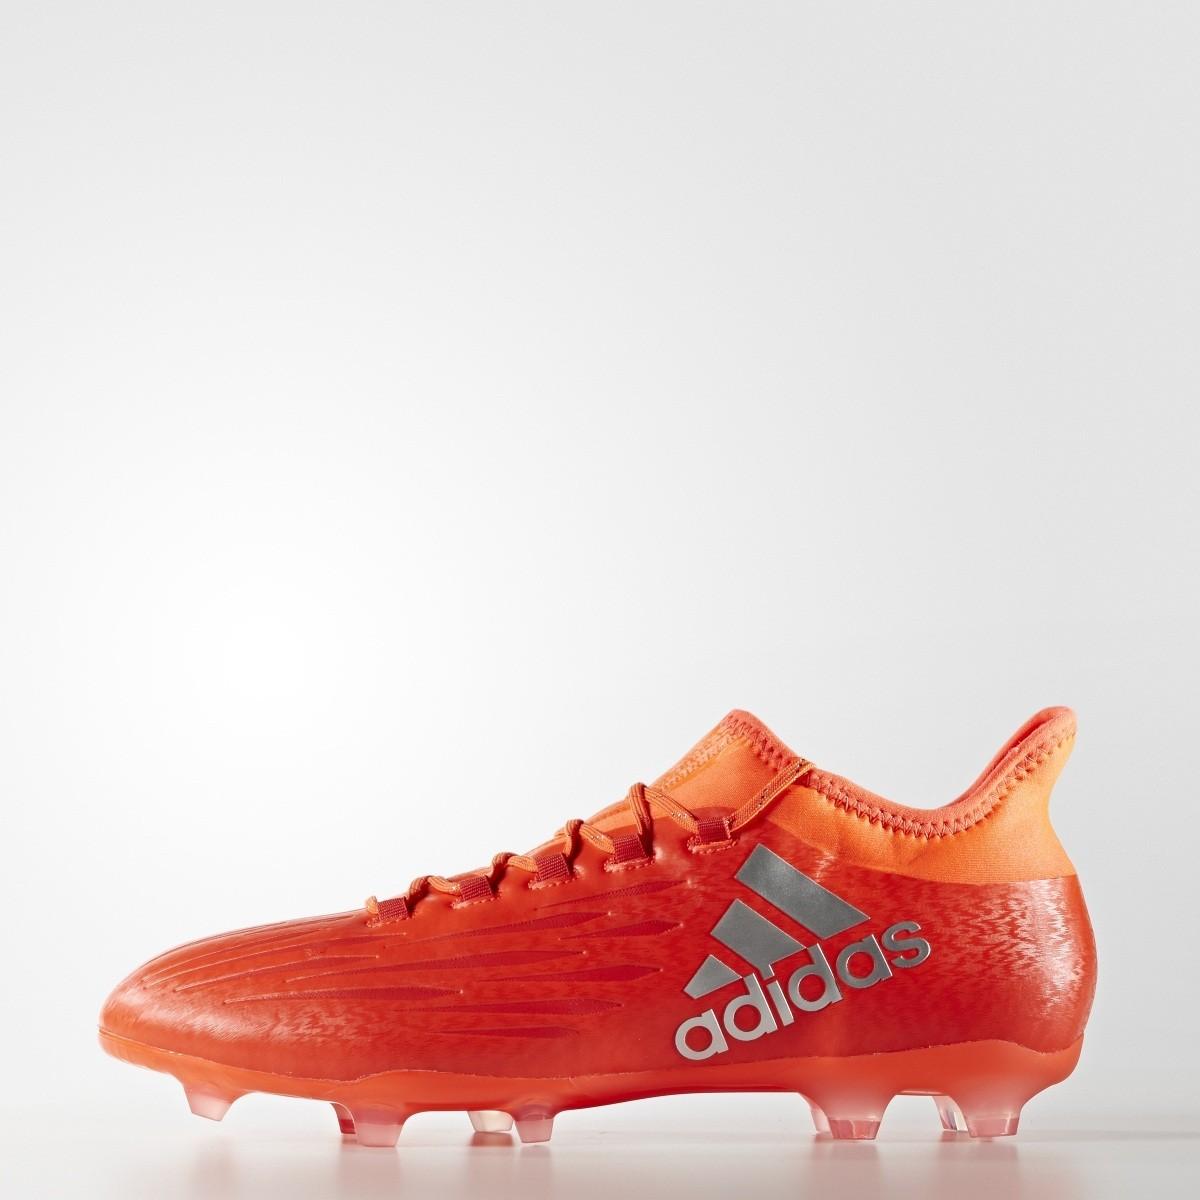 ccf2ab658c0e0 Pánské kopačky adidas X 16.2 FG | D-Sport